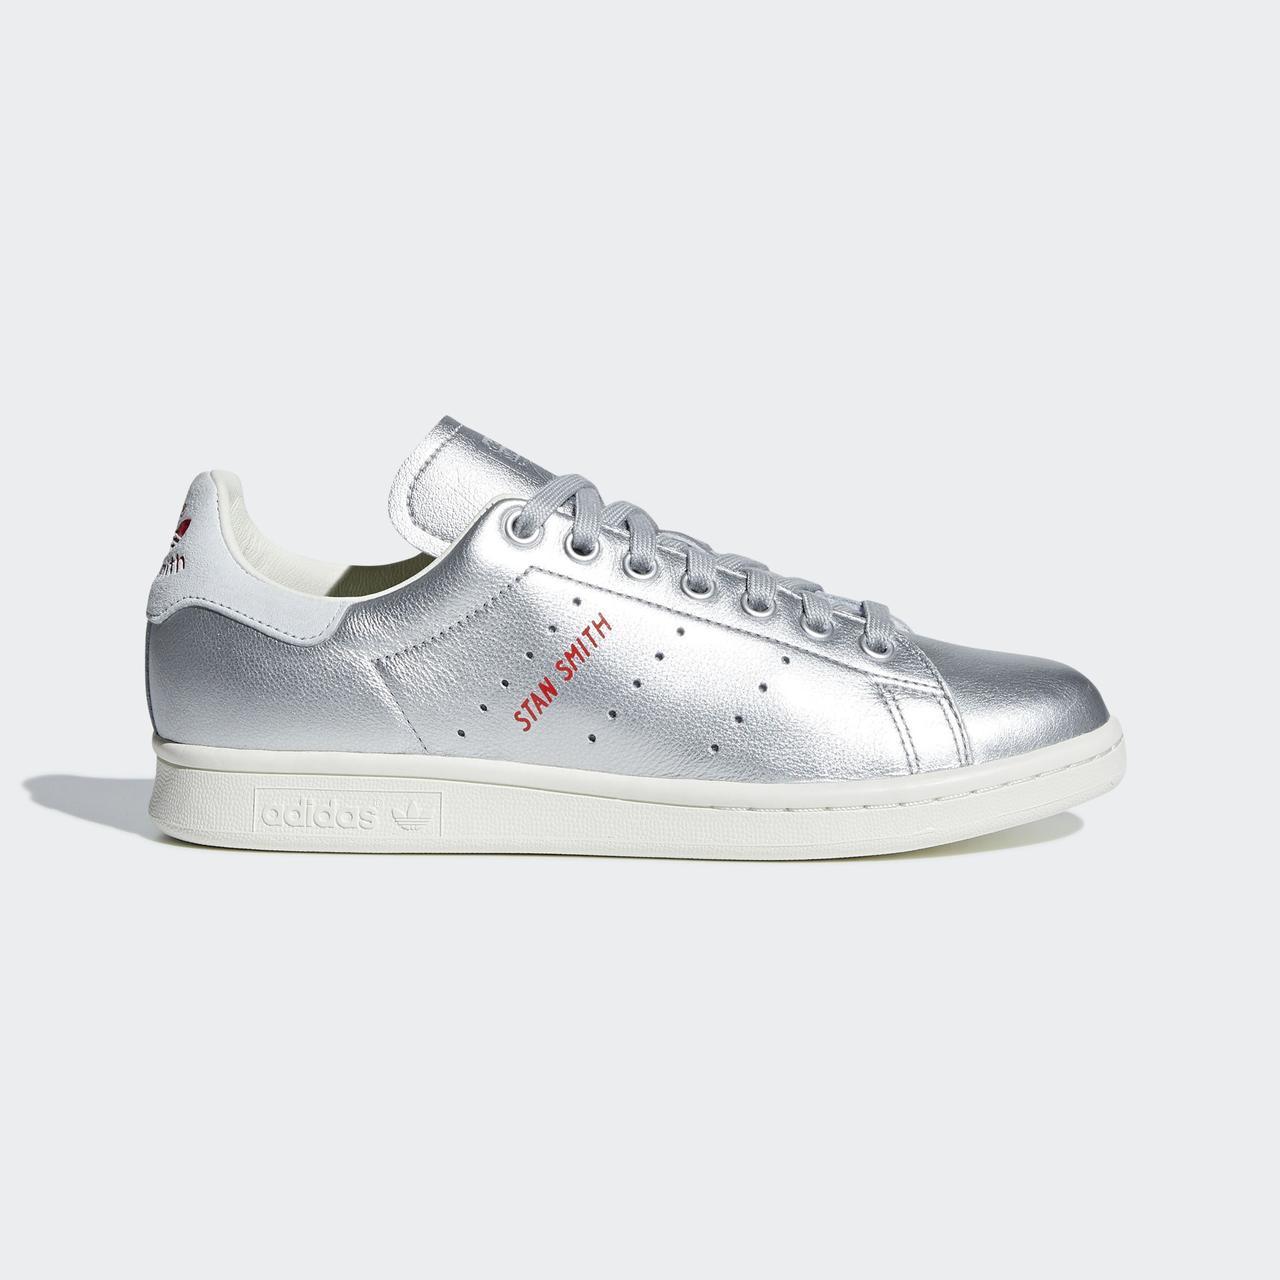 Женские кроссовки Adidas Originals Stan Smith (Артикул: B41750)